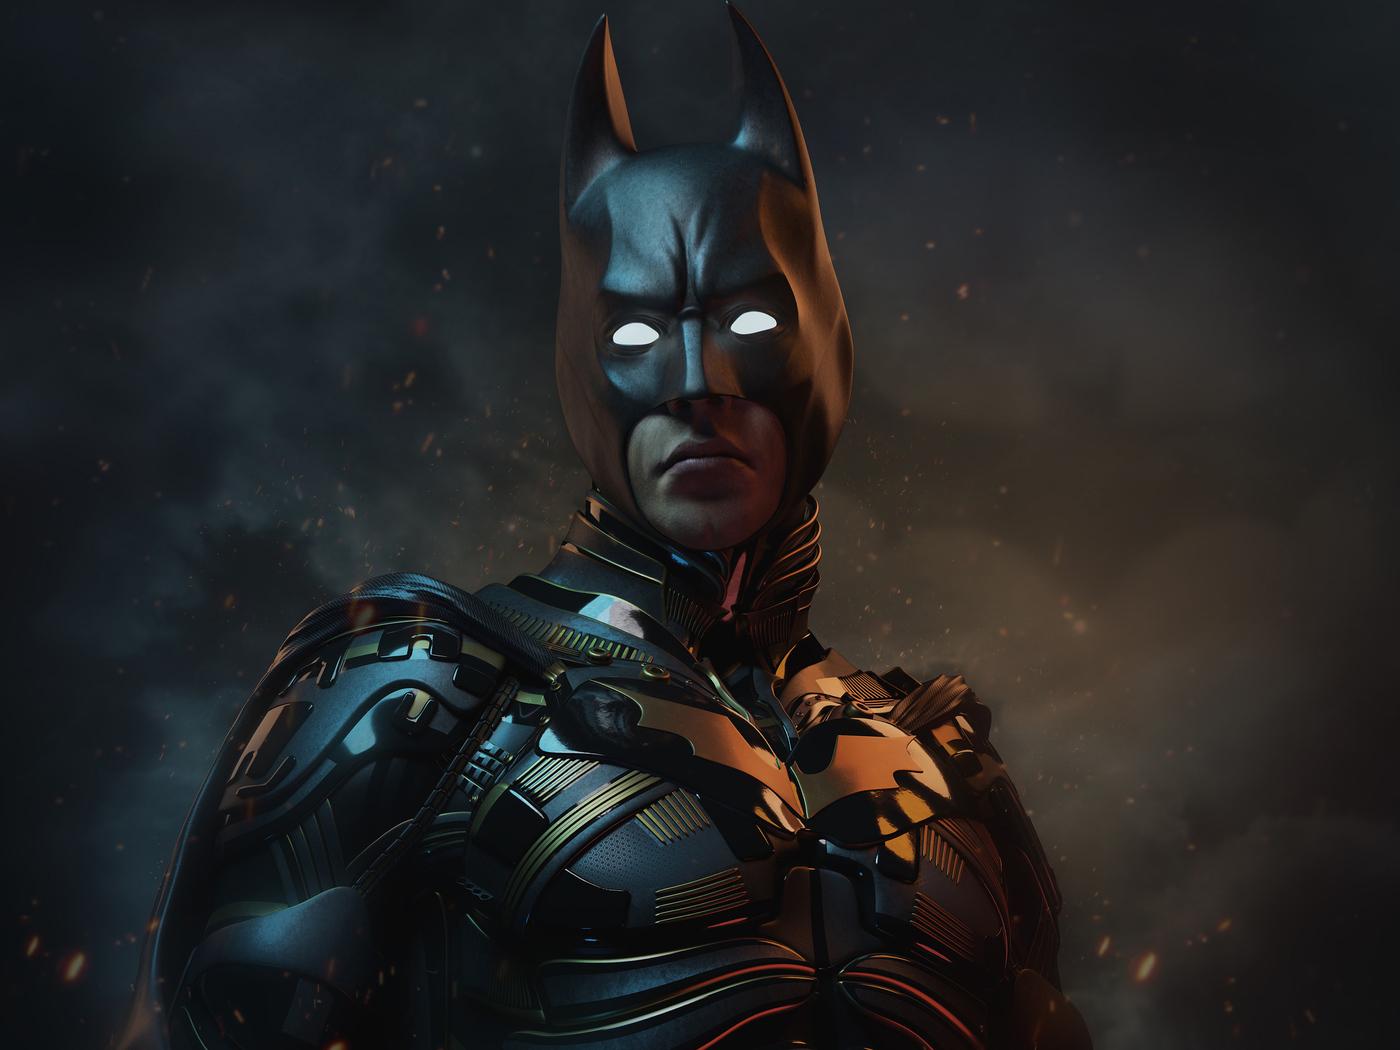 batman-as-christian-bale-4k-2i.jpg